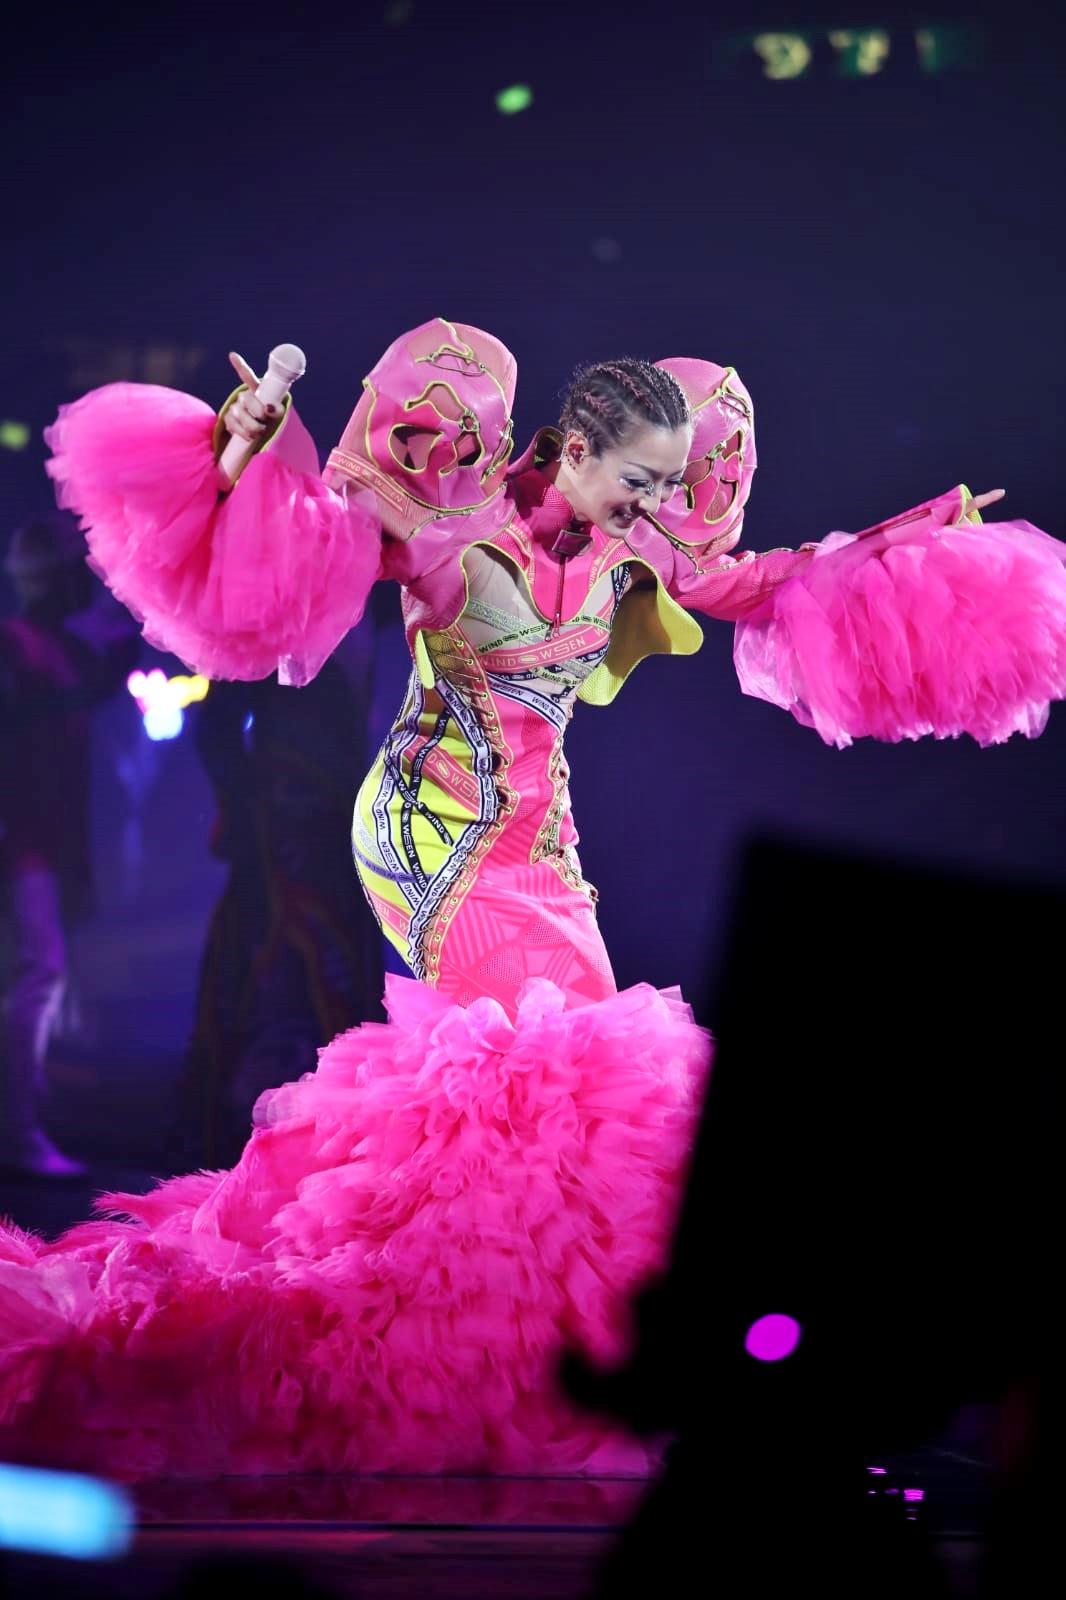 Sammi唱完一首歌即極速1分鐘換另一套螢光粉紅長裙,令全場嘩然。